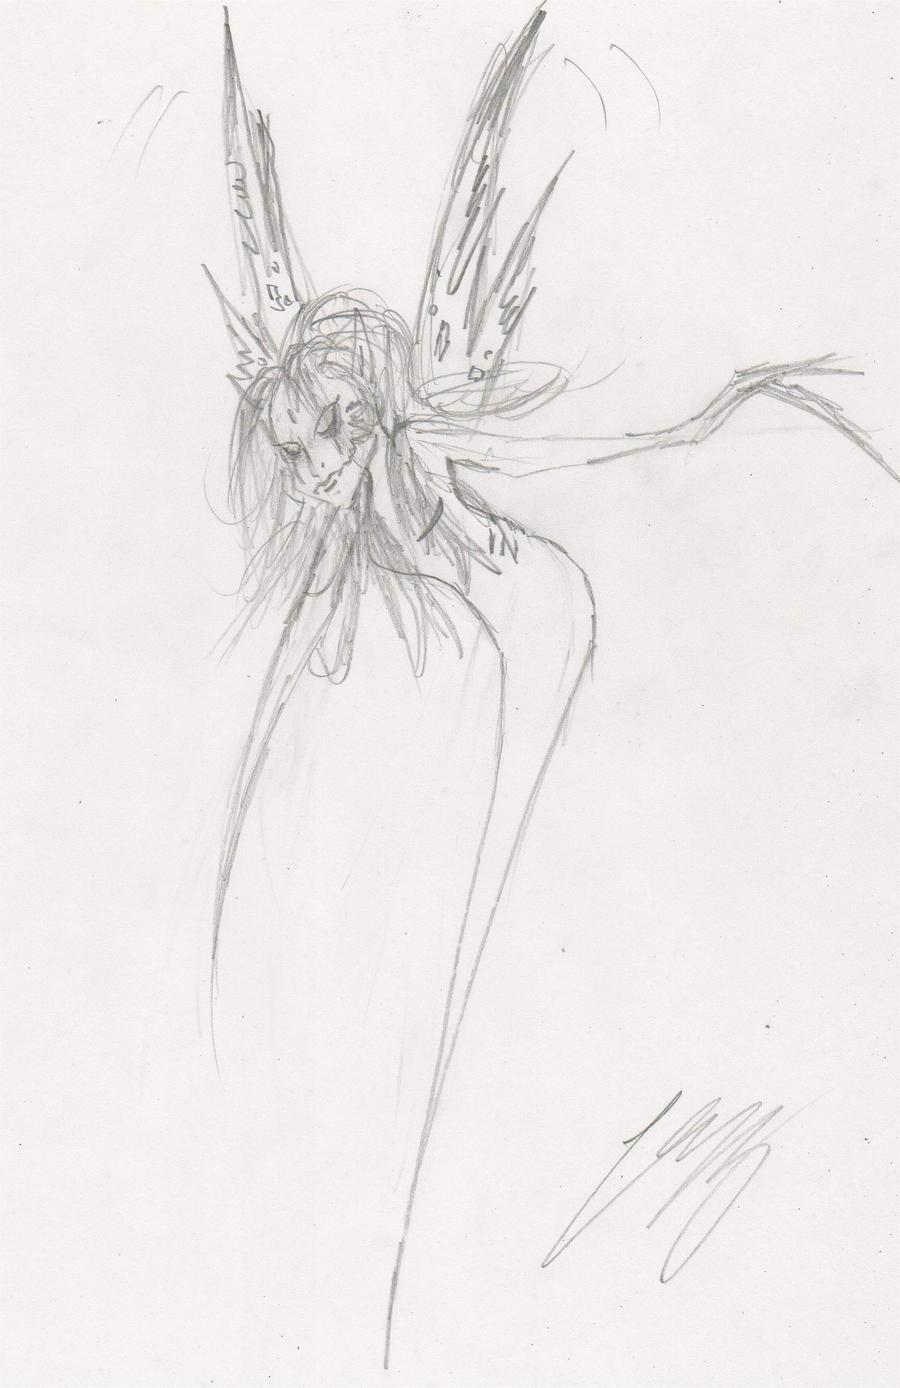 Evil fairy by leyzy on DeviantArt